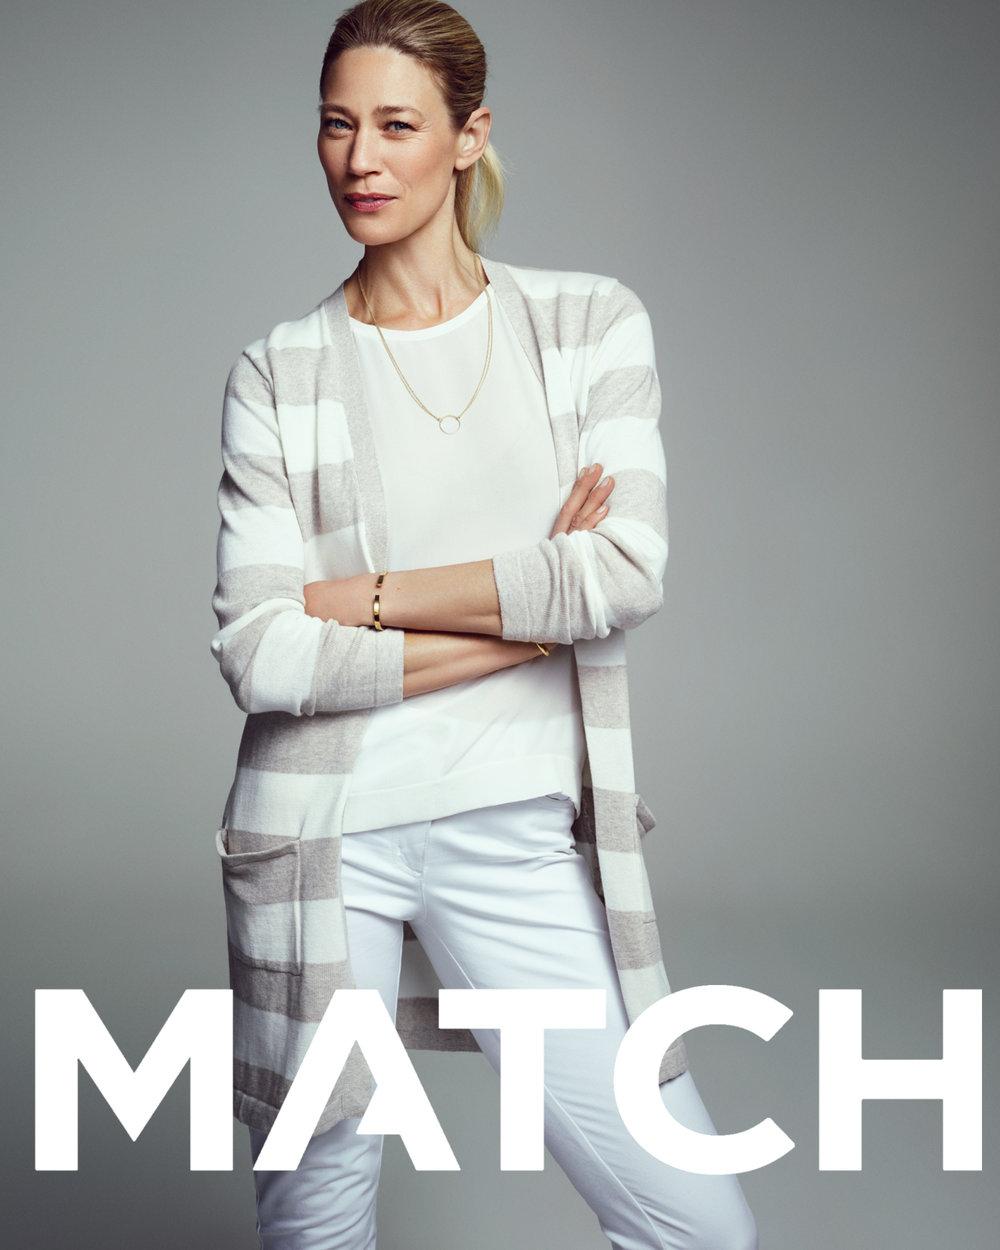 match6.jpg